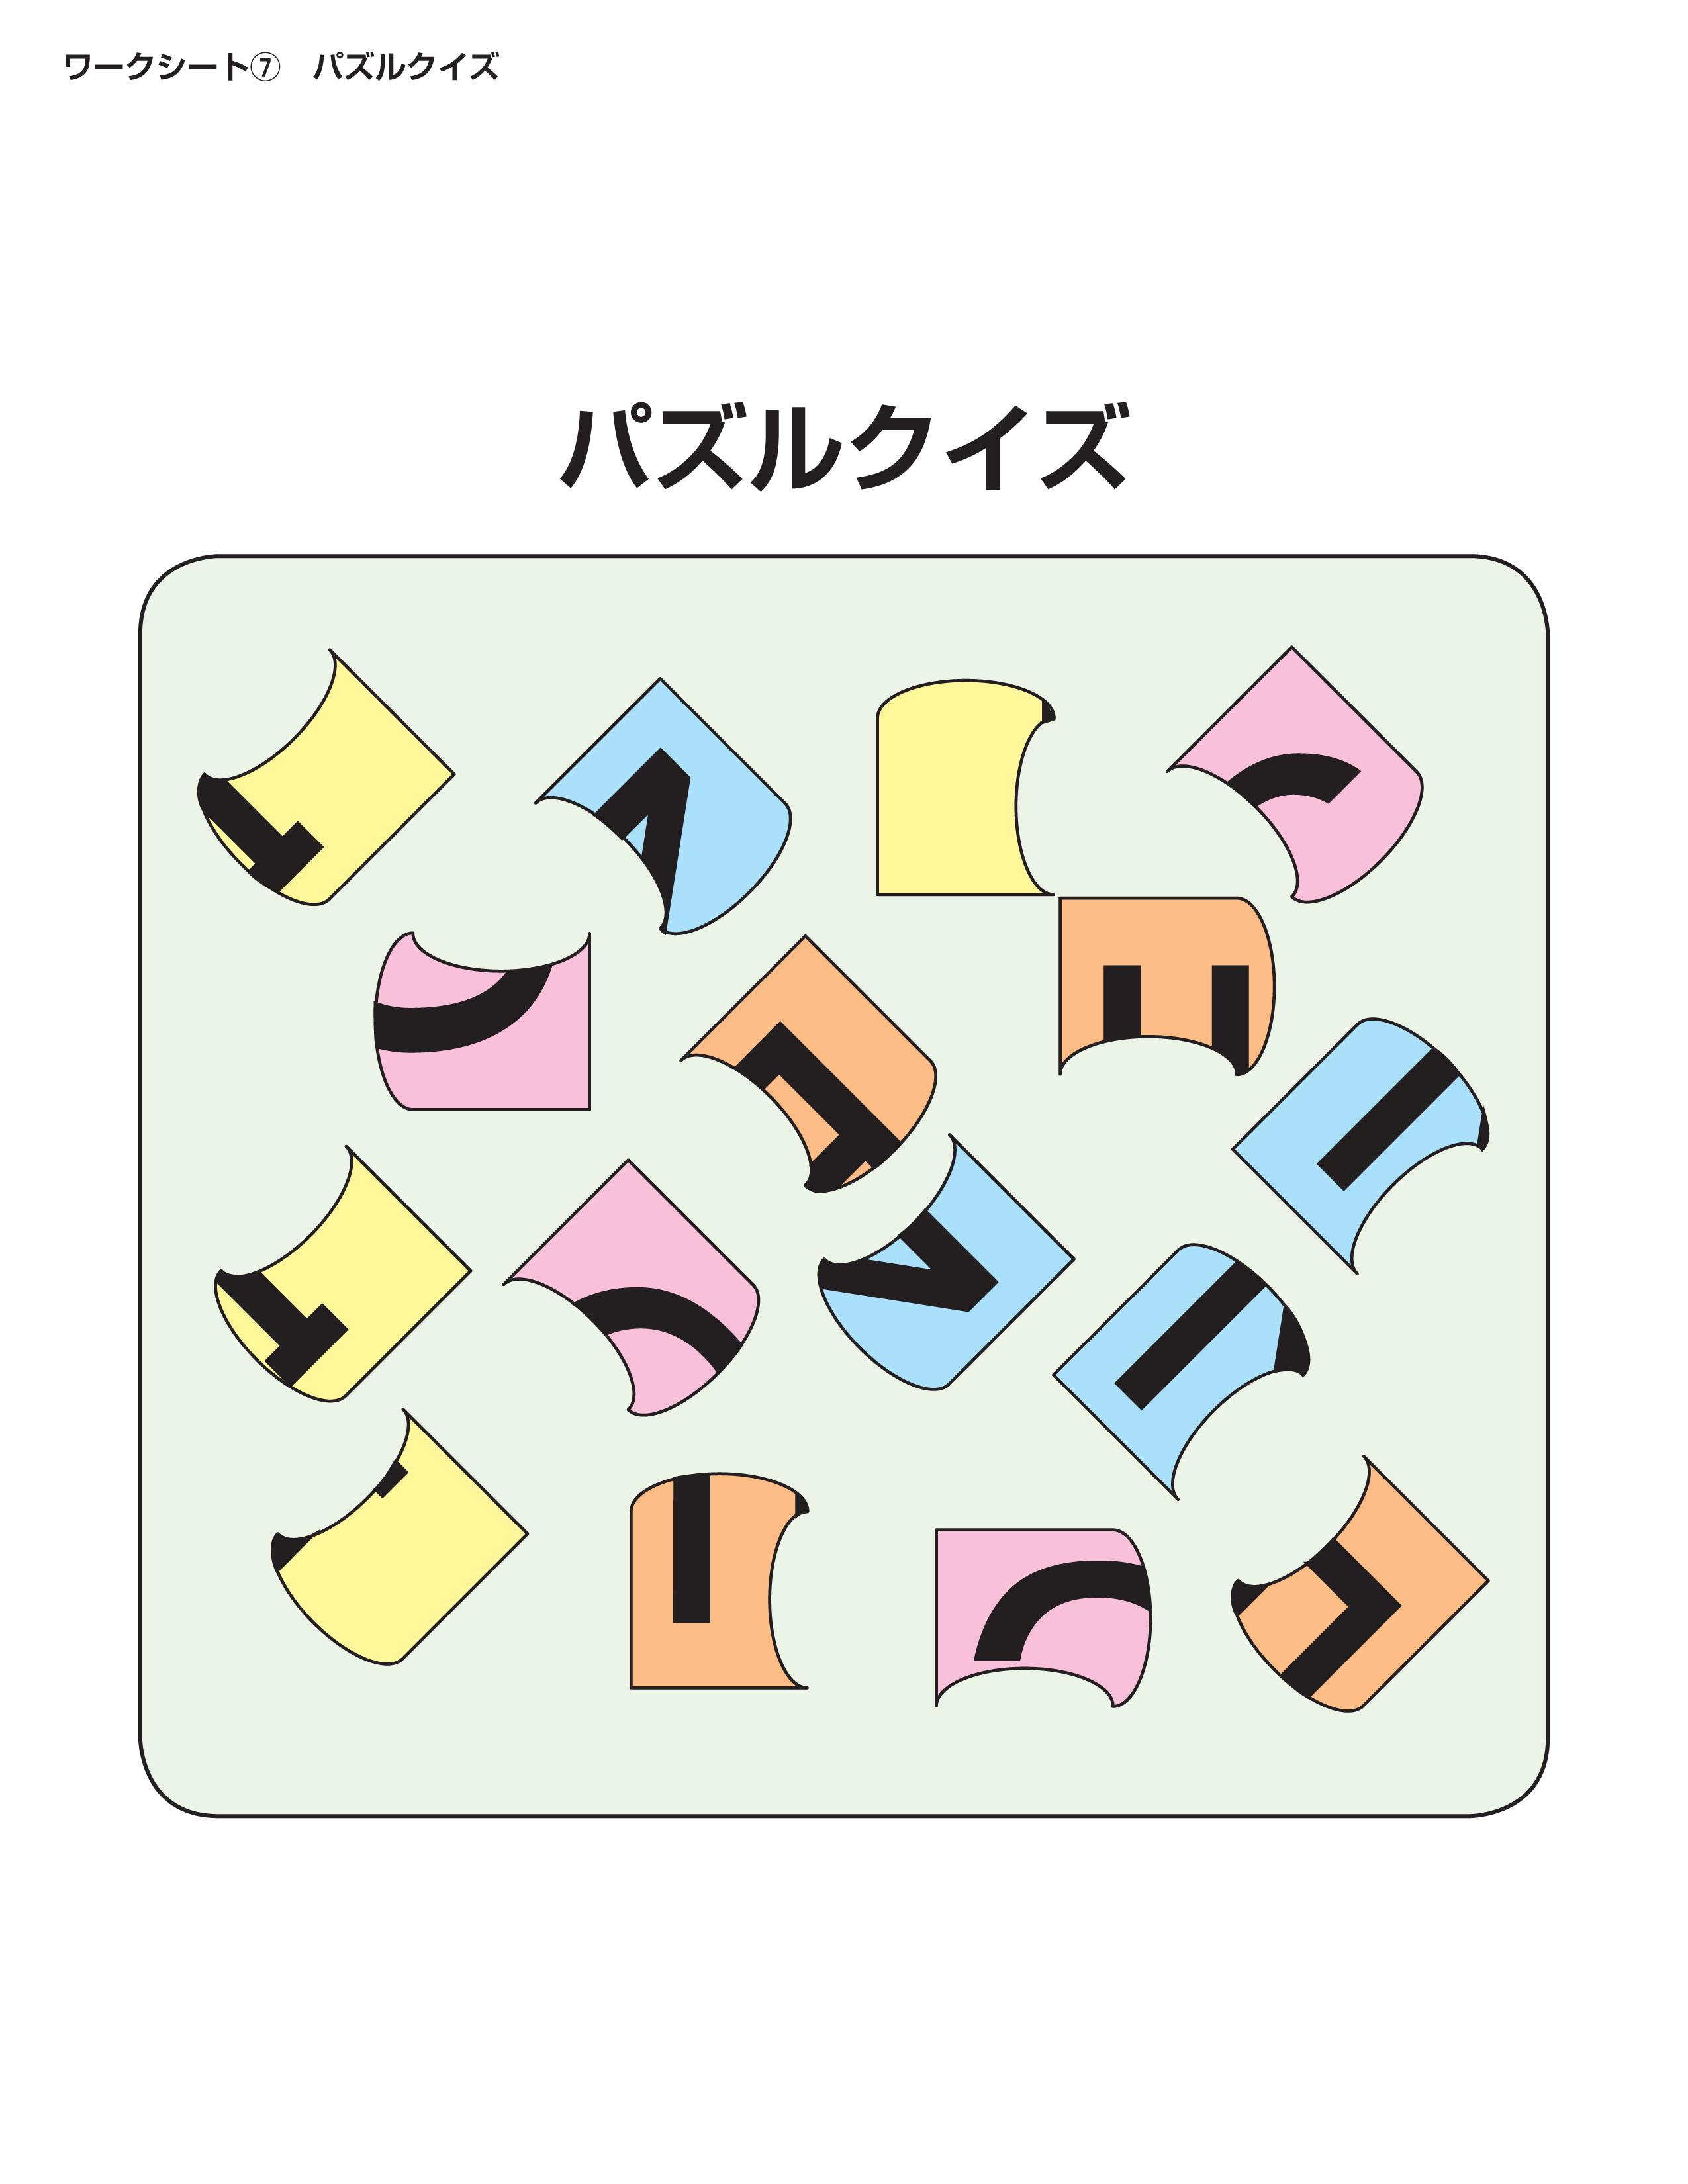 Hifriends1 Worksheet 07 Puzzle